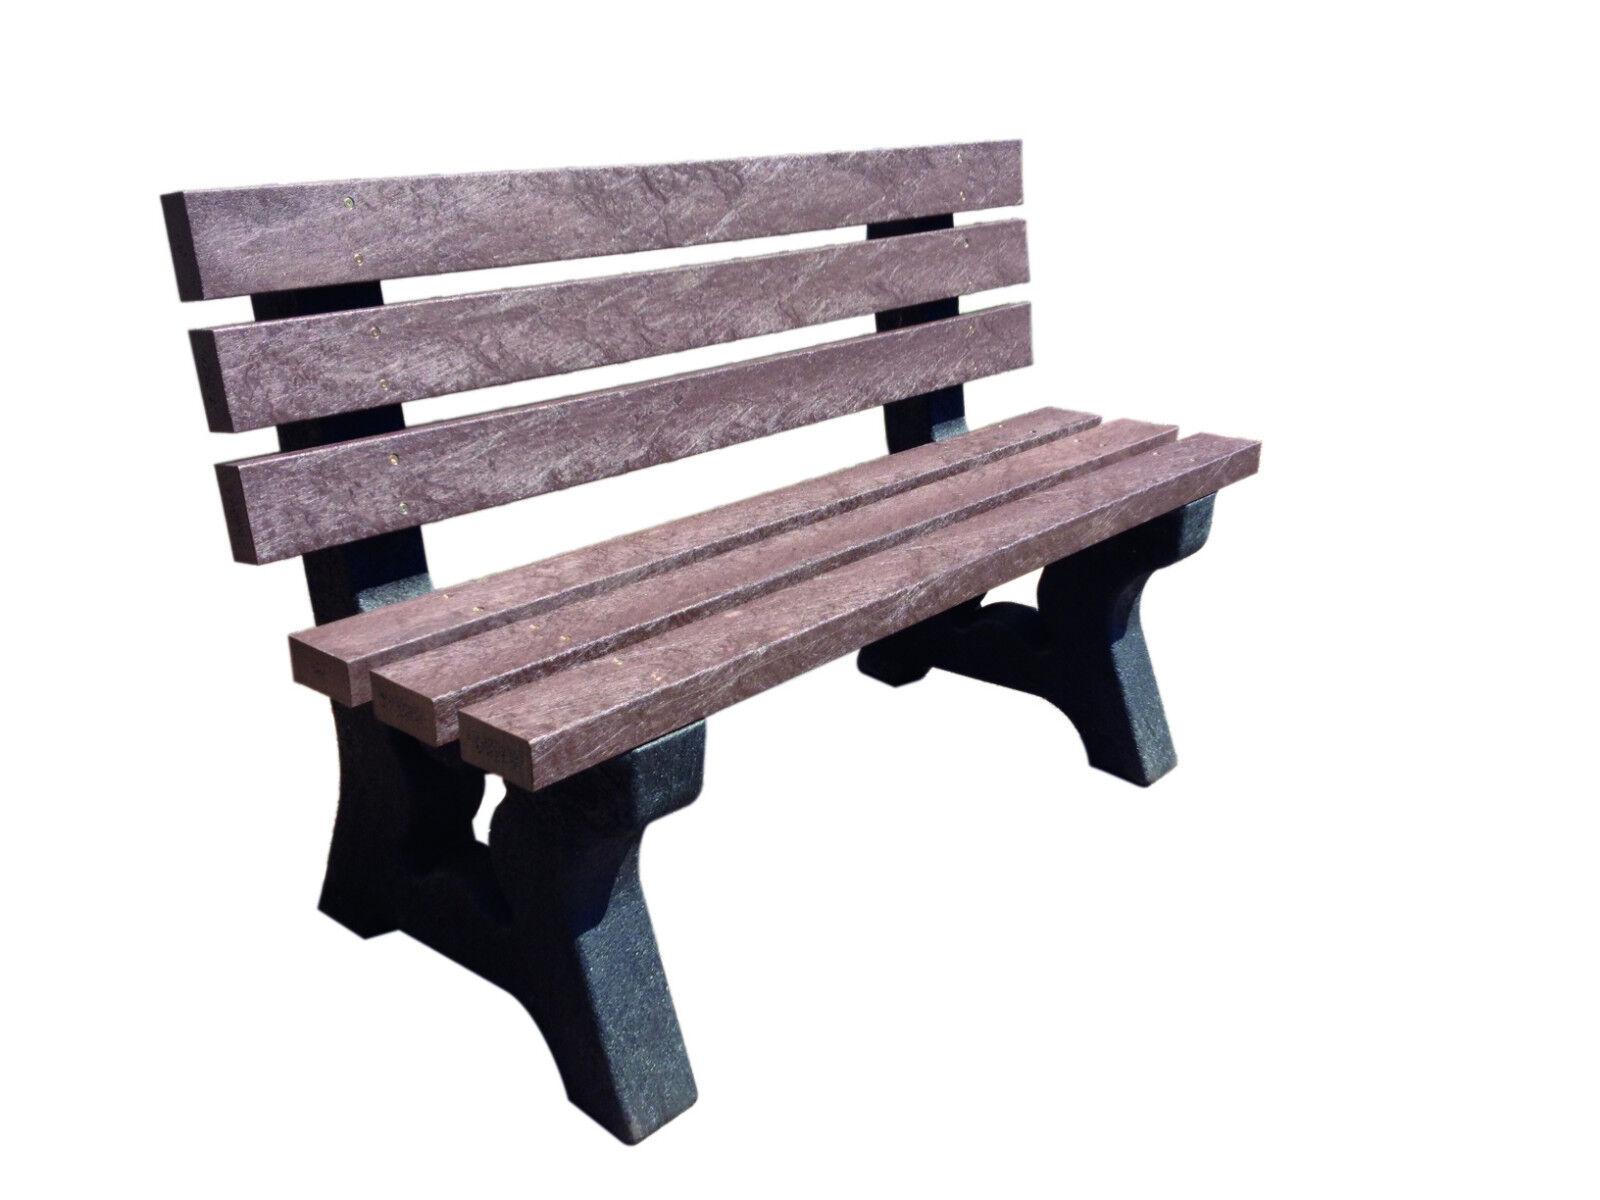 100 Recycled Plastic Garden Park Seat Bench Outdoor 1 4m Ebay